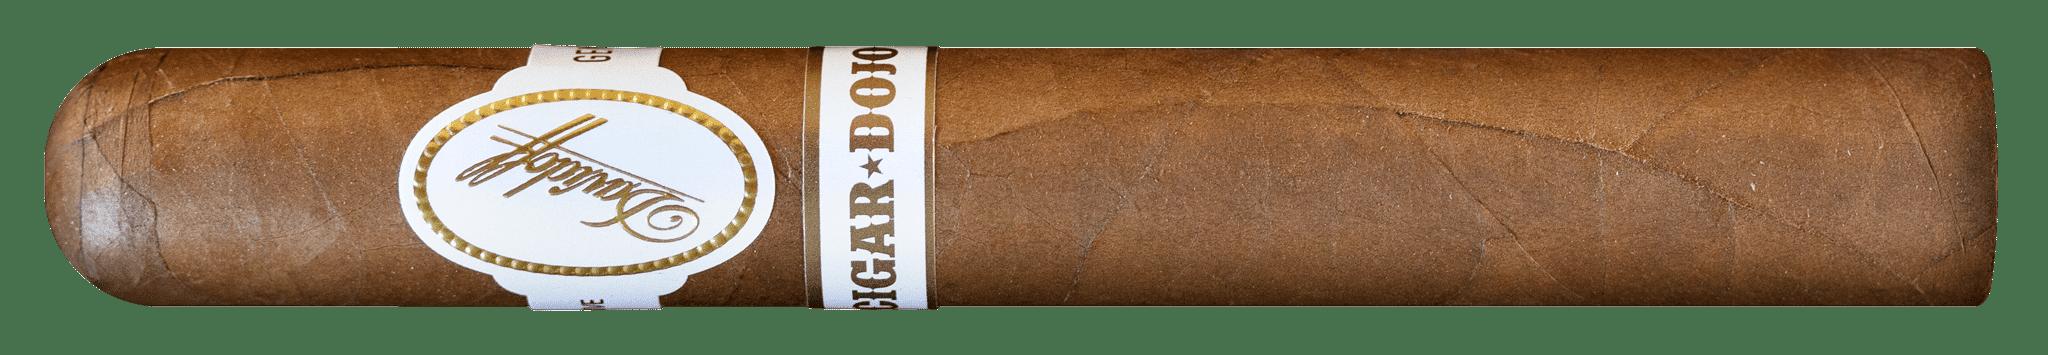 Cigar News: Davidoff Cigars Announces Cigar Dojo Exclusive 2018